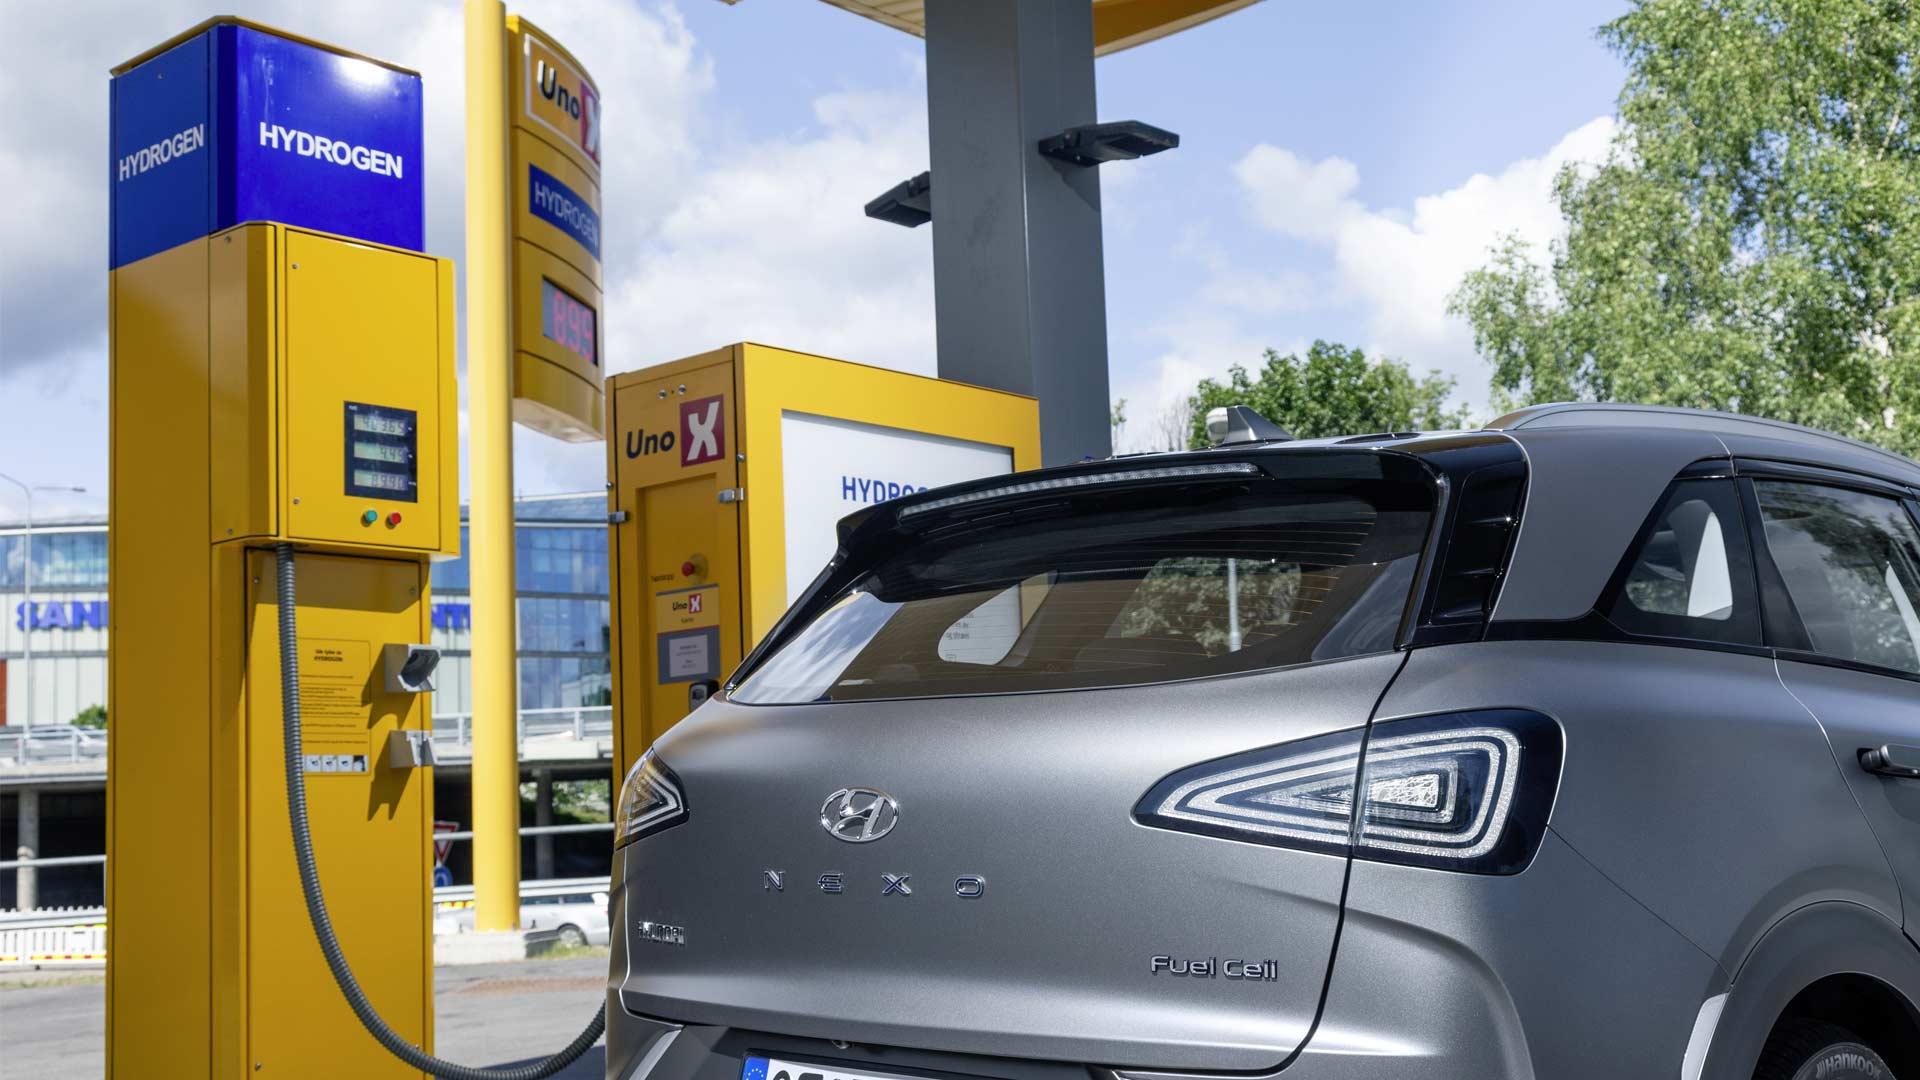 2019-Hyundai-Nexo-fuel-cell-SUV-Hydrogen-refuelling